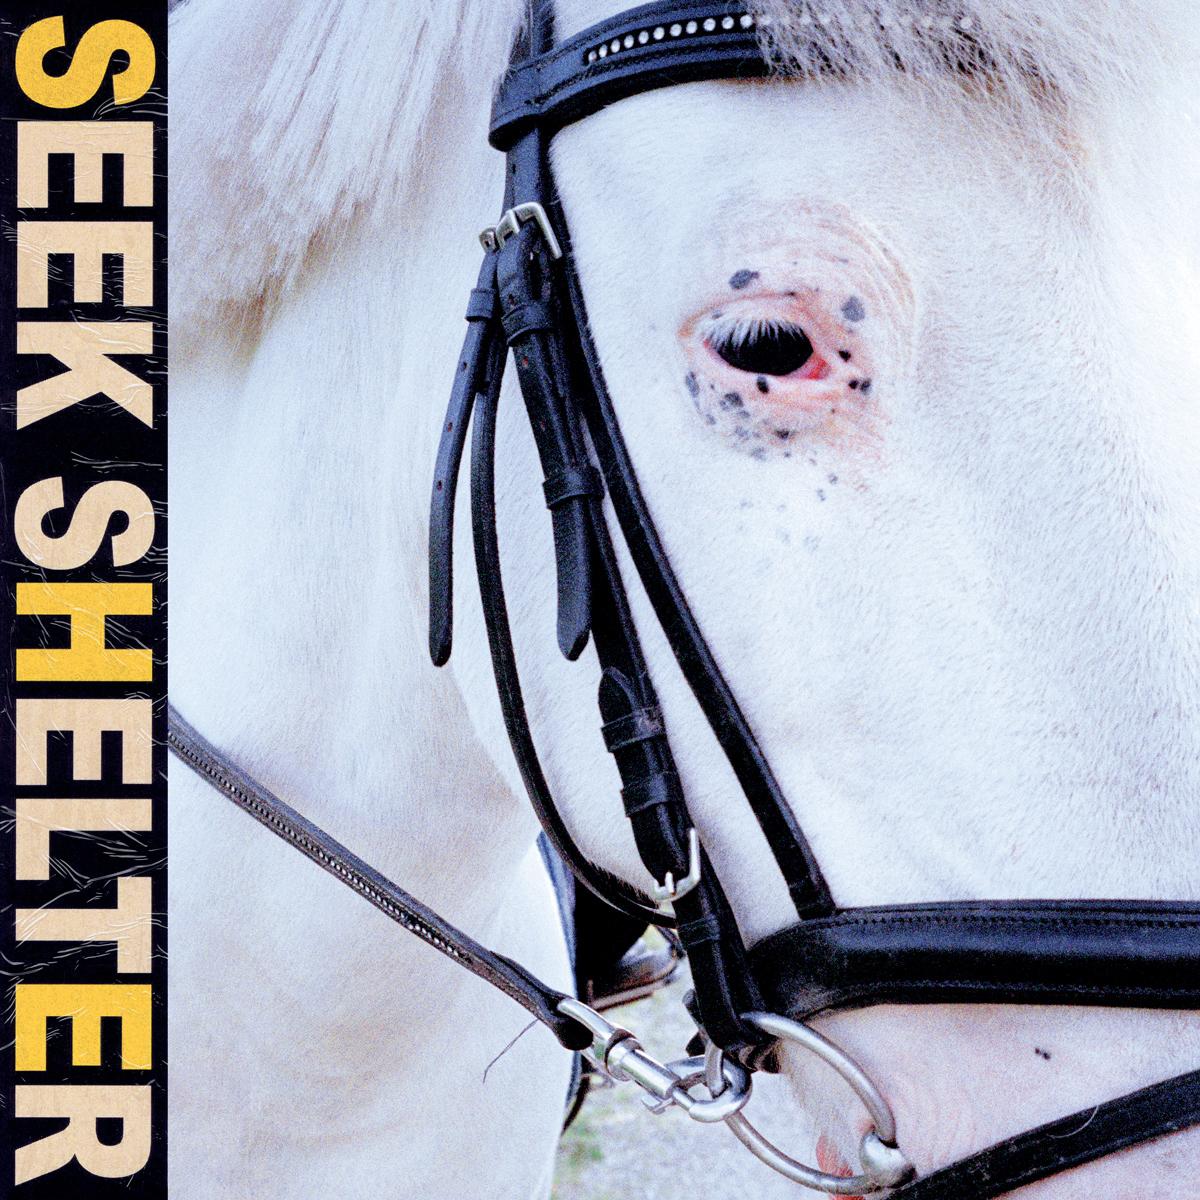 Iceage - Seek Shelter [LP]